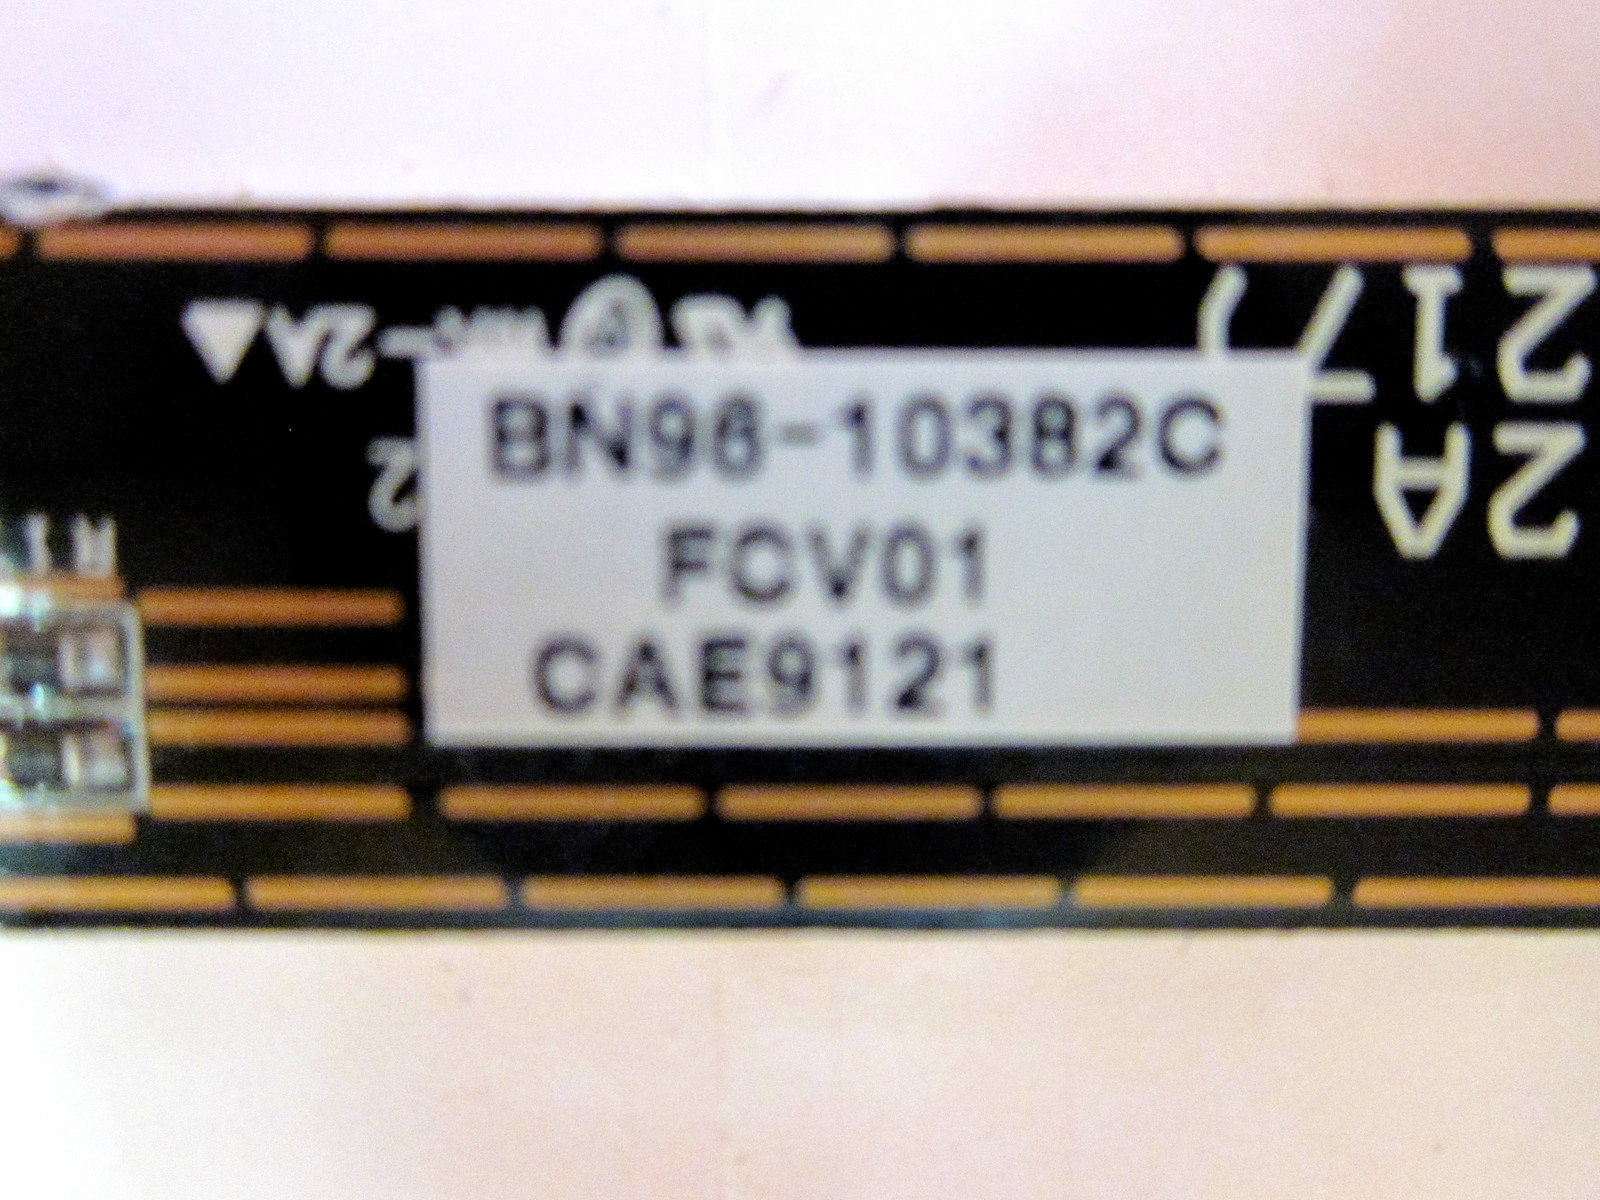 Samsung BN96-10382C (BN41-01192A) P-Touch Keypad Controller Board (See List)